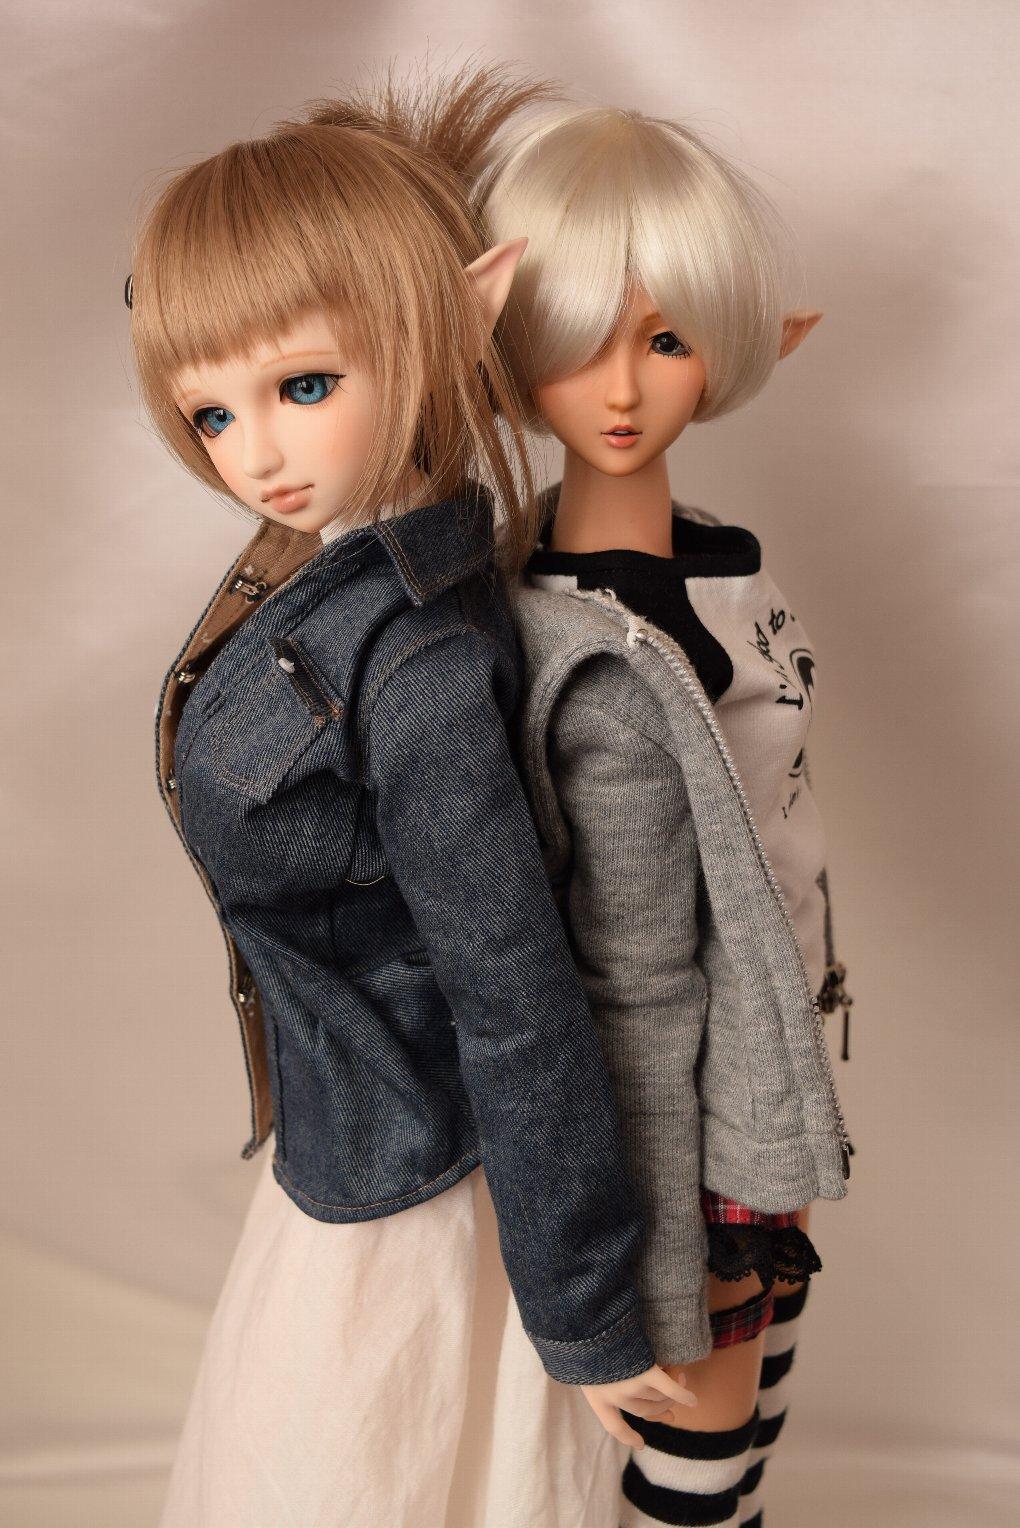 doll_3297.jpg